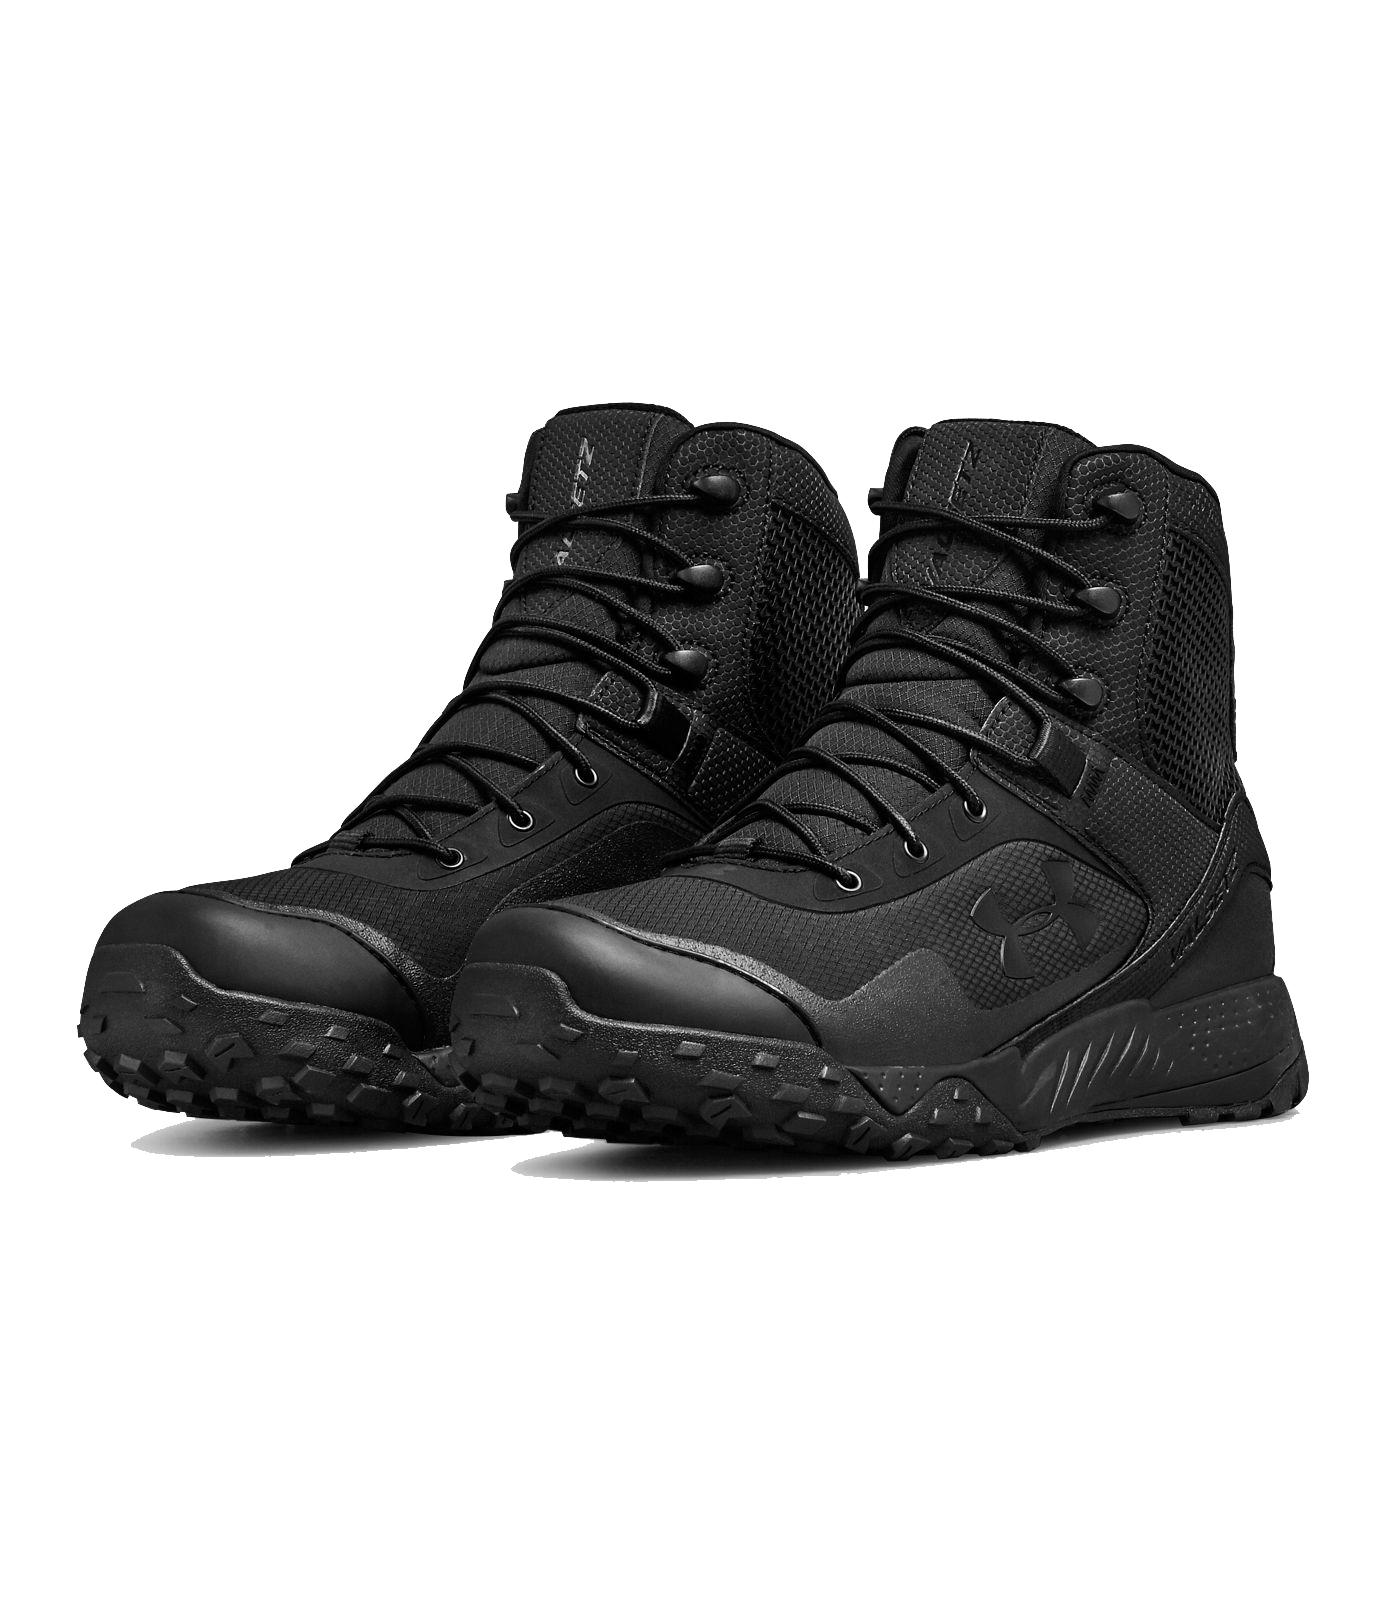 Under-Armour-Men-039-s-UA-Valsetz-RTS-1-5-Tactical-Boots-302103 thumbnail 9